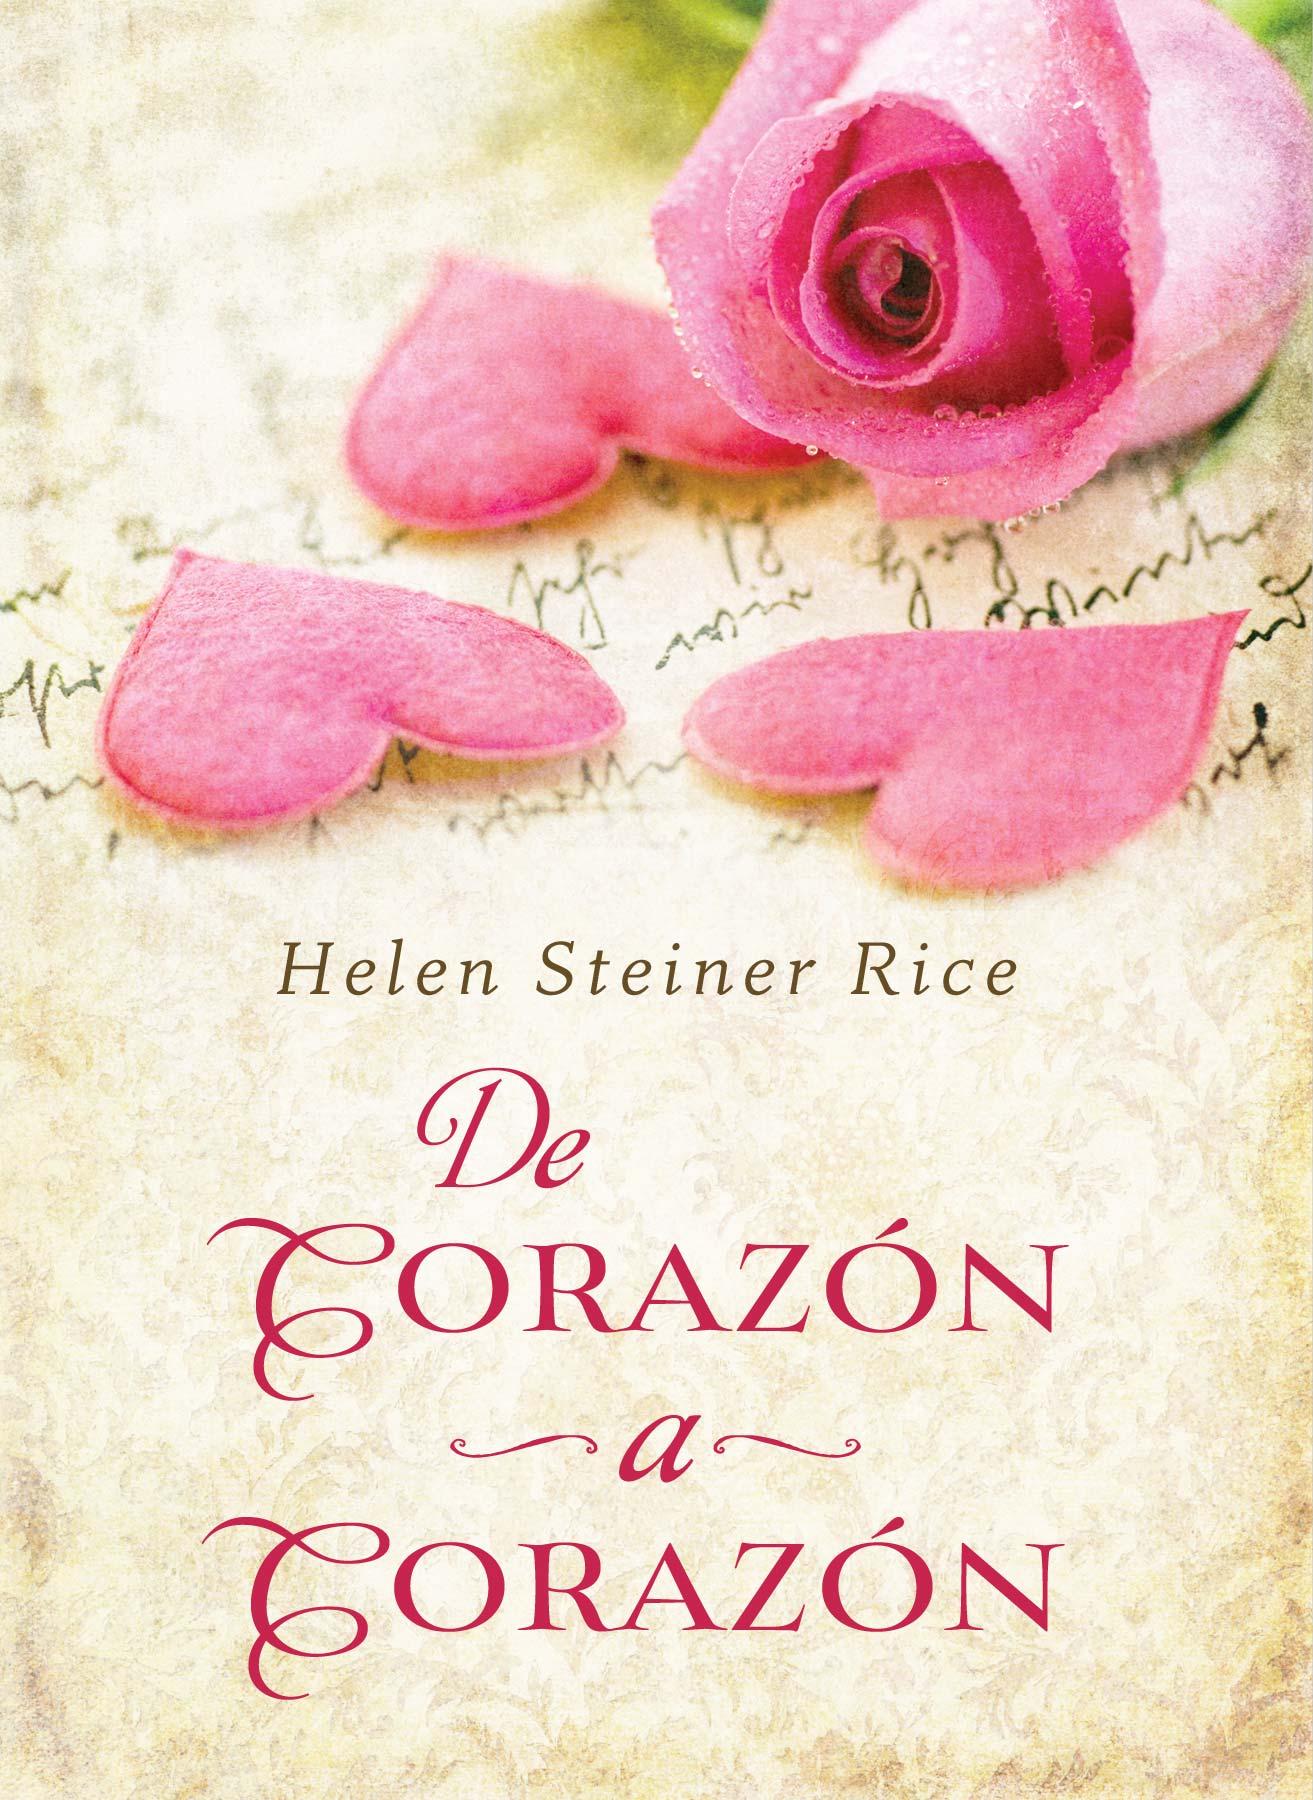 Helen Steiner Rice Birthday Quotes Quotesgram